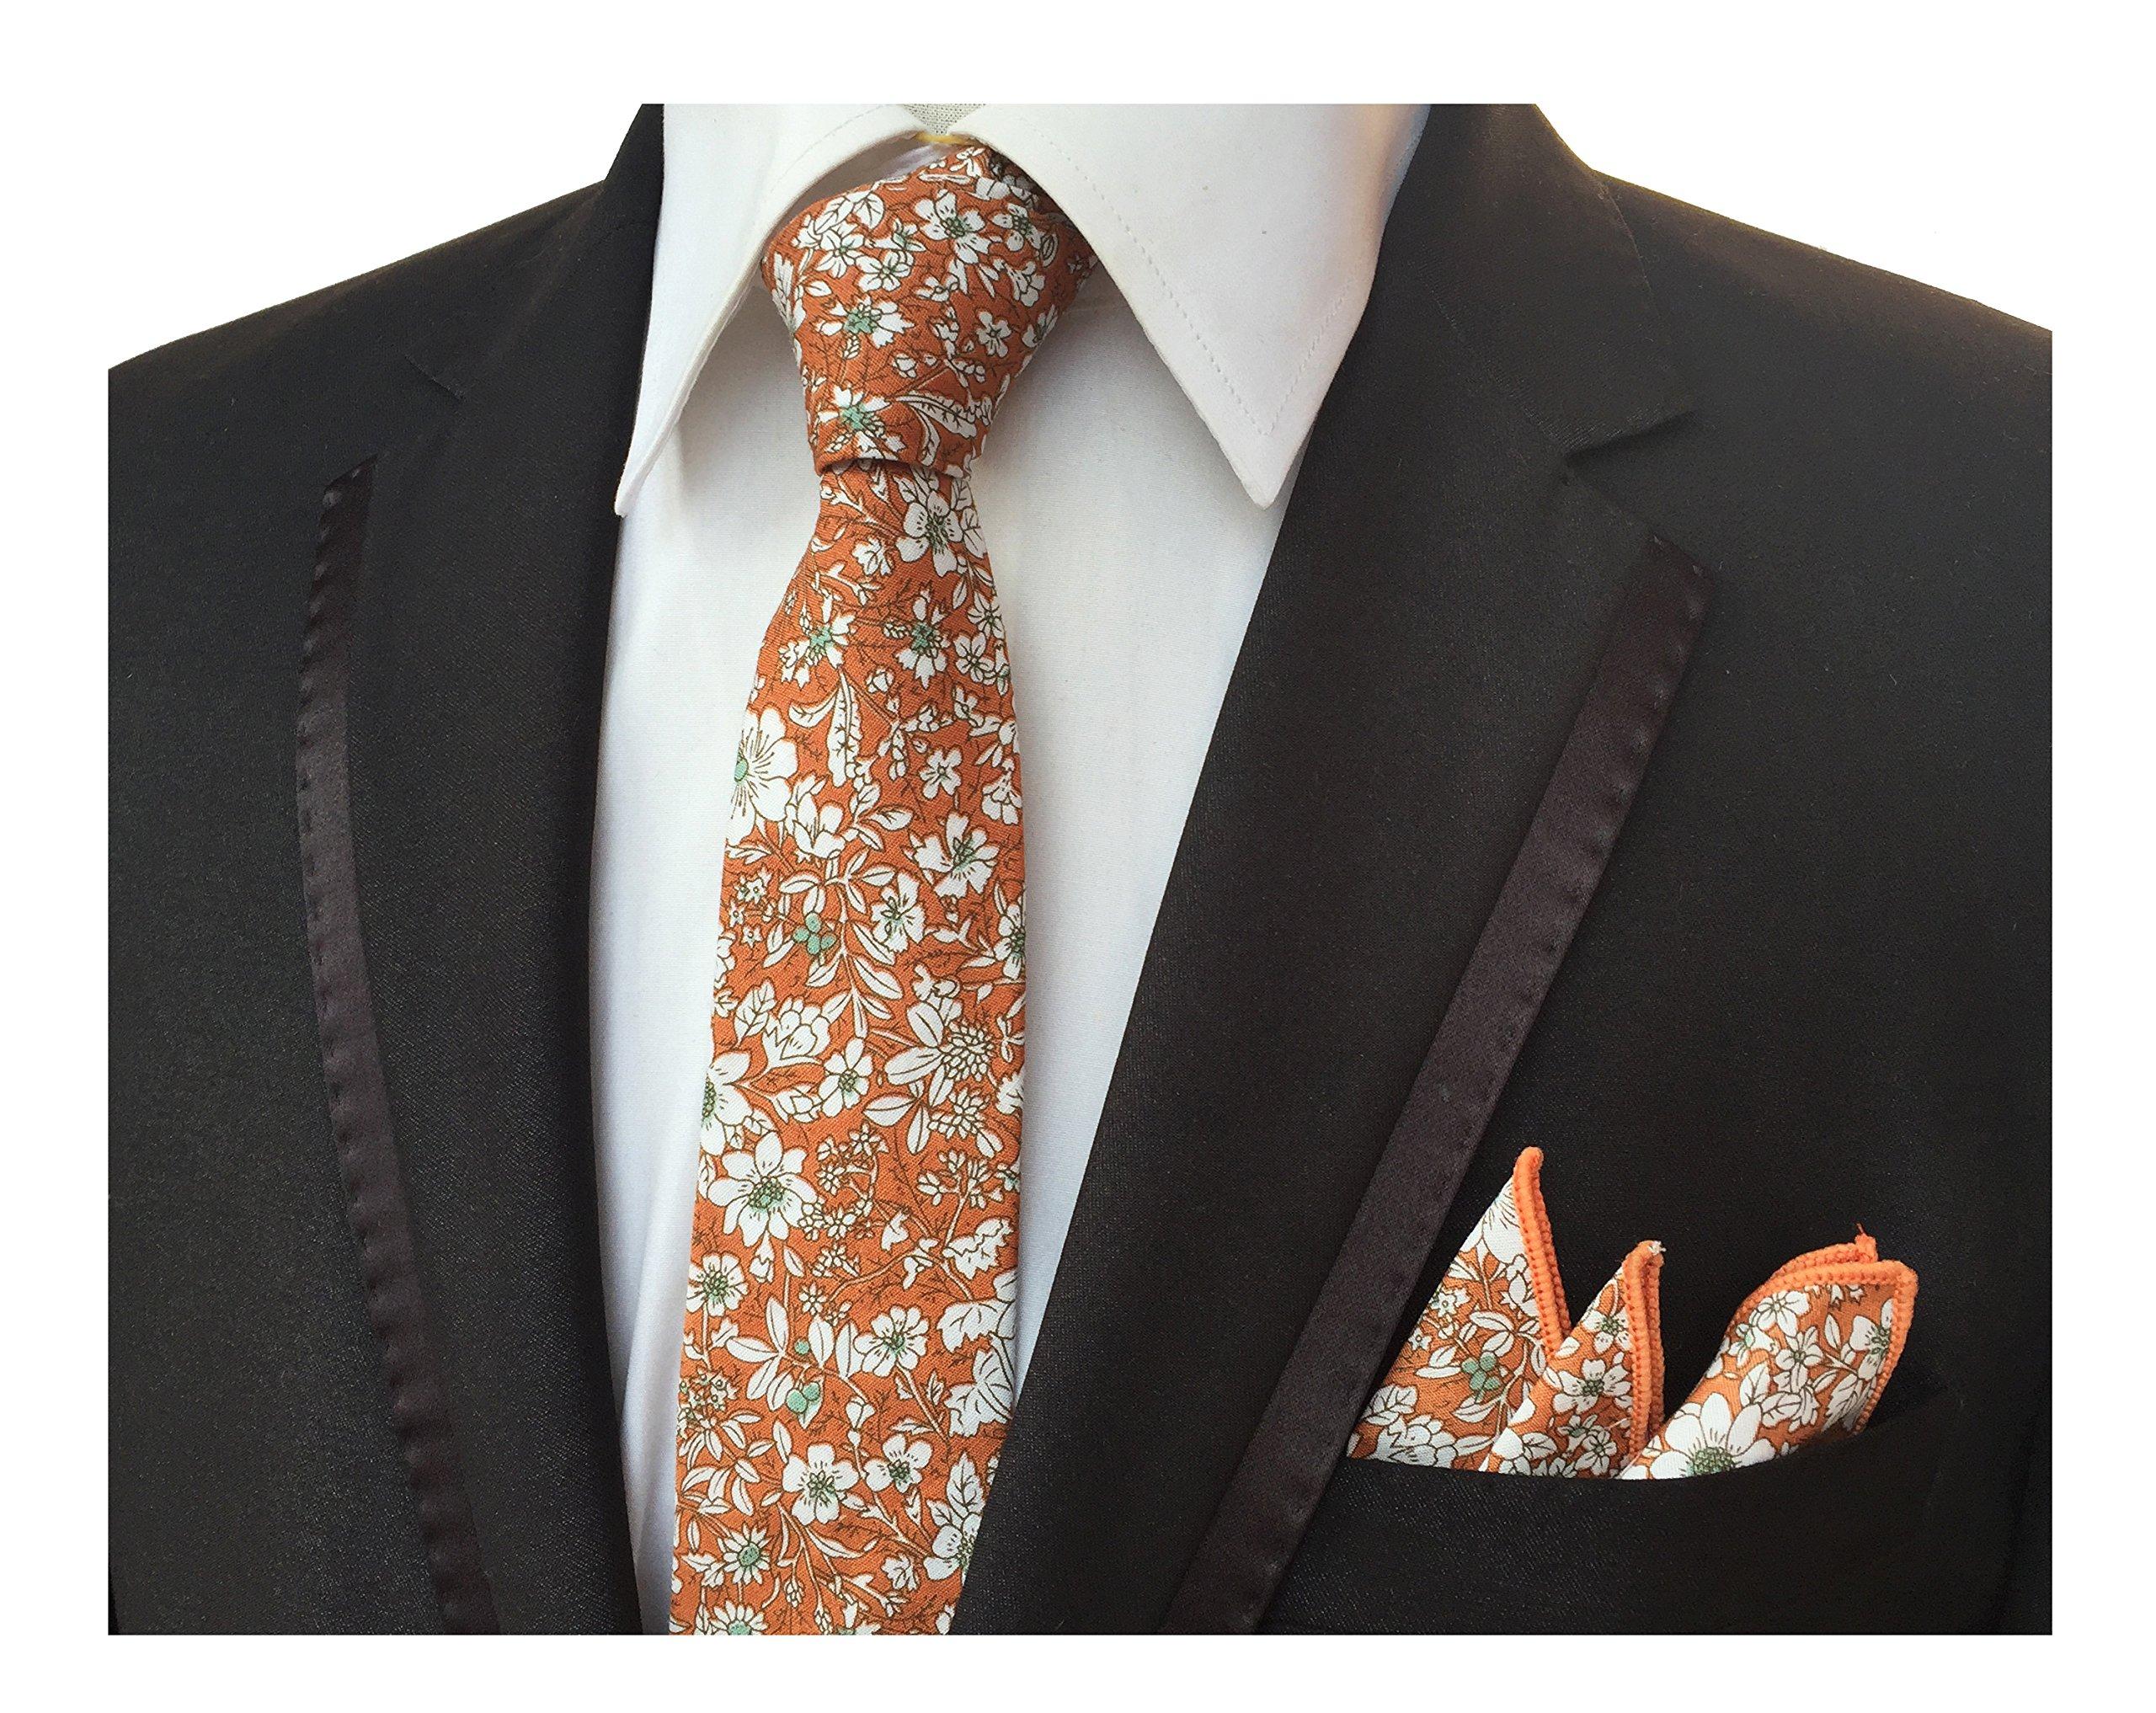 Men's Cotton Printed Floral Necktie,Pocket Square,Lapel Flower Set Skinny Ties by Elfeves